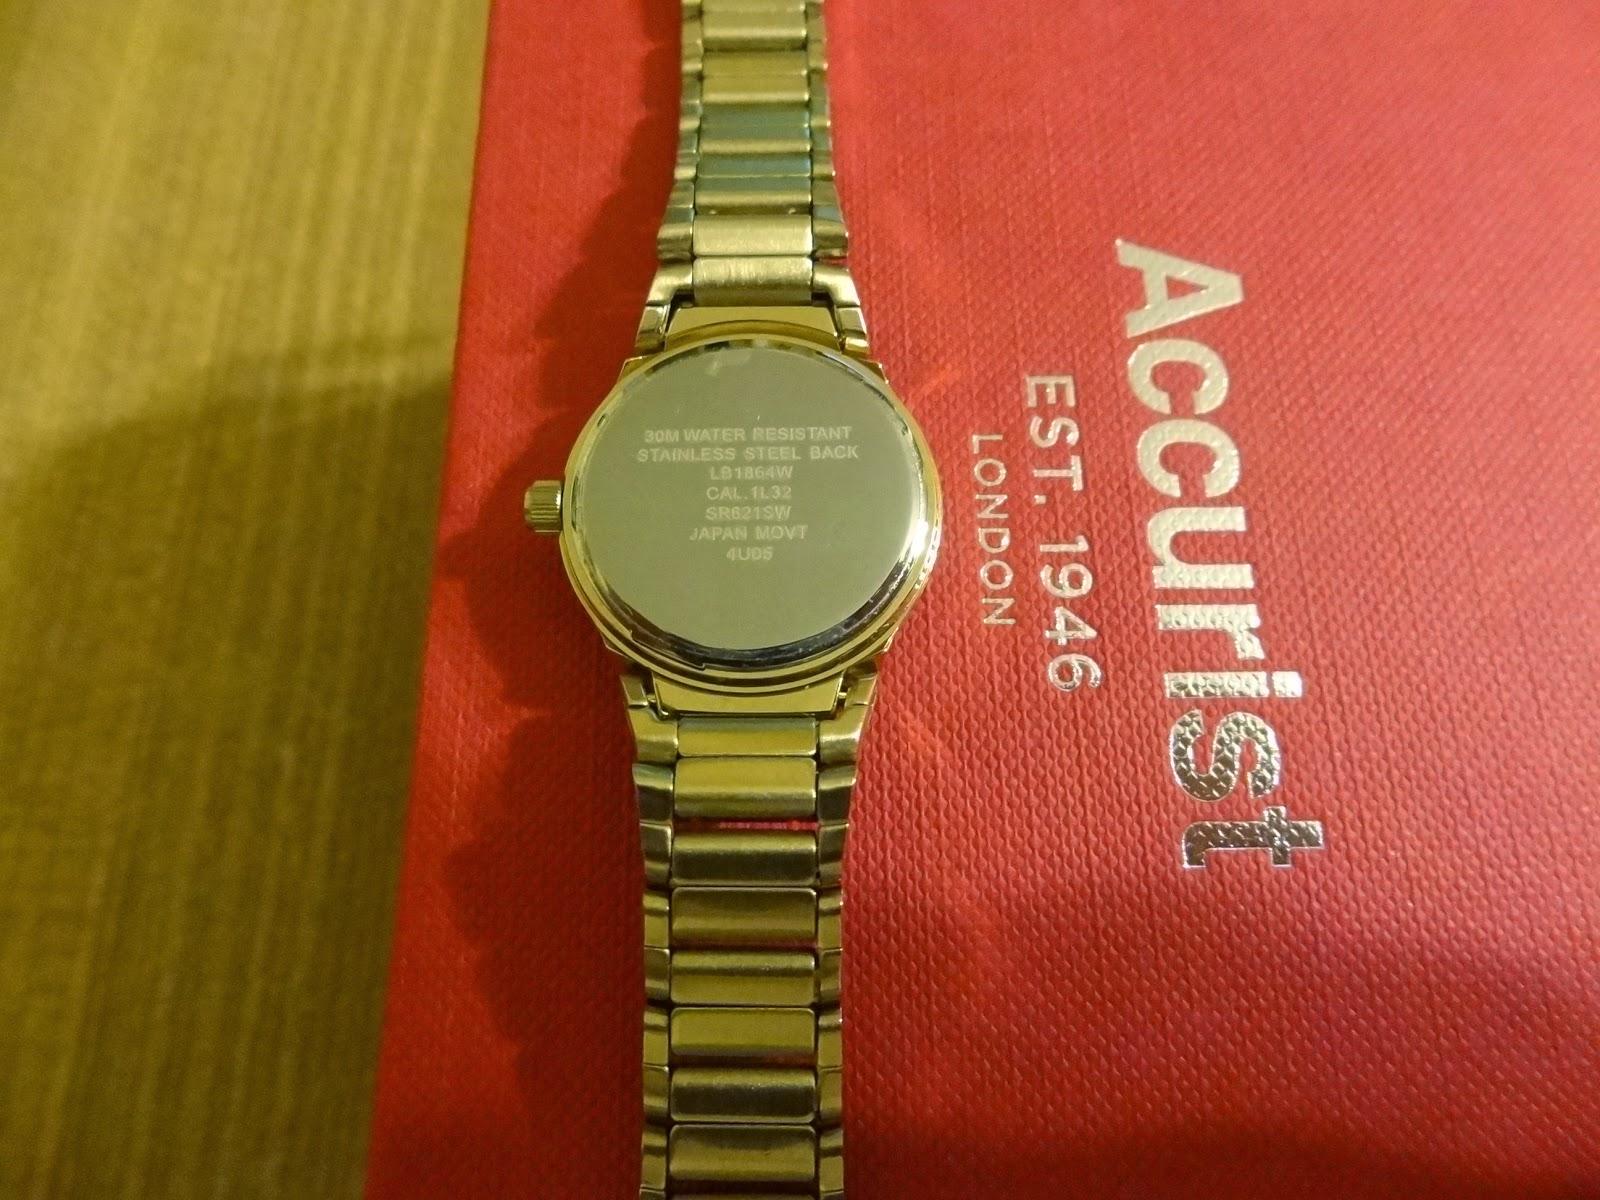 Accurist LB1864W watch